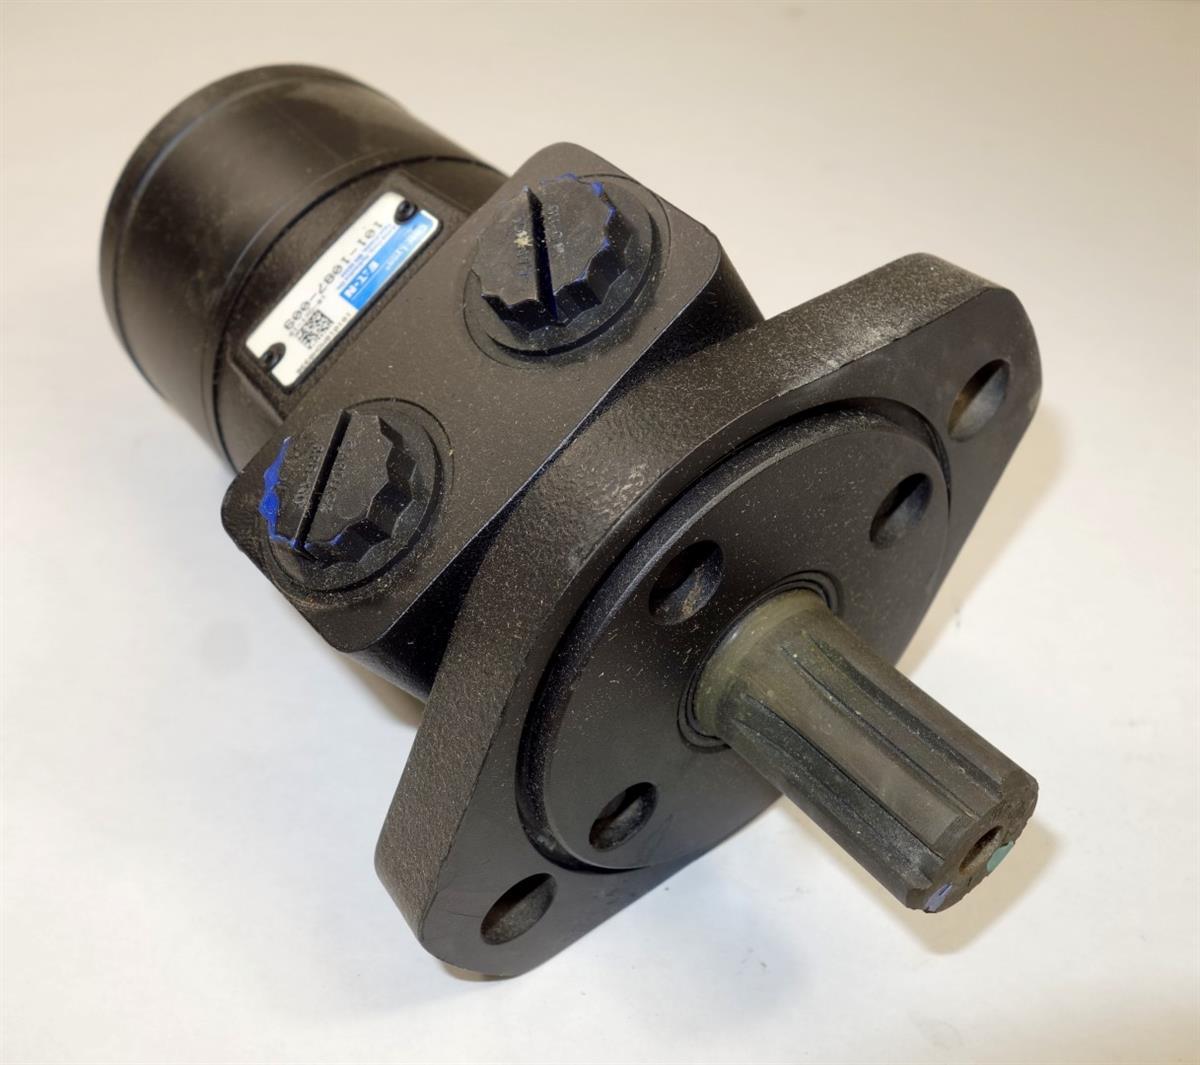 Eaton char lynn hydraulic gerotor spool valve motor for Hydraulic motor spool valve